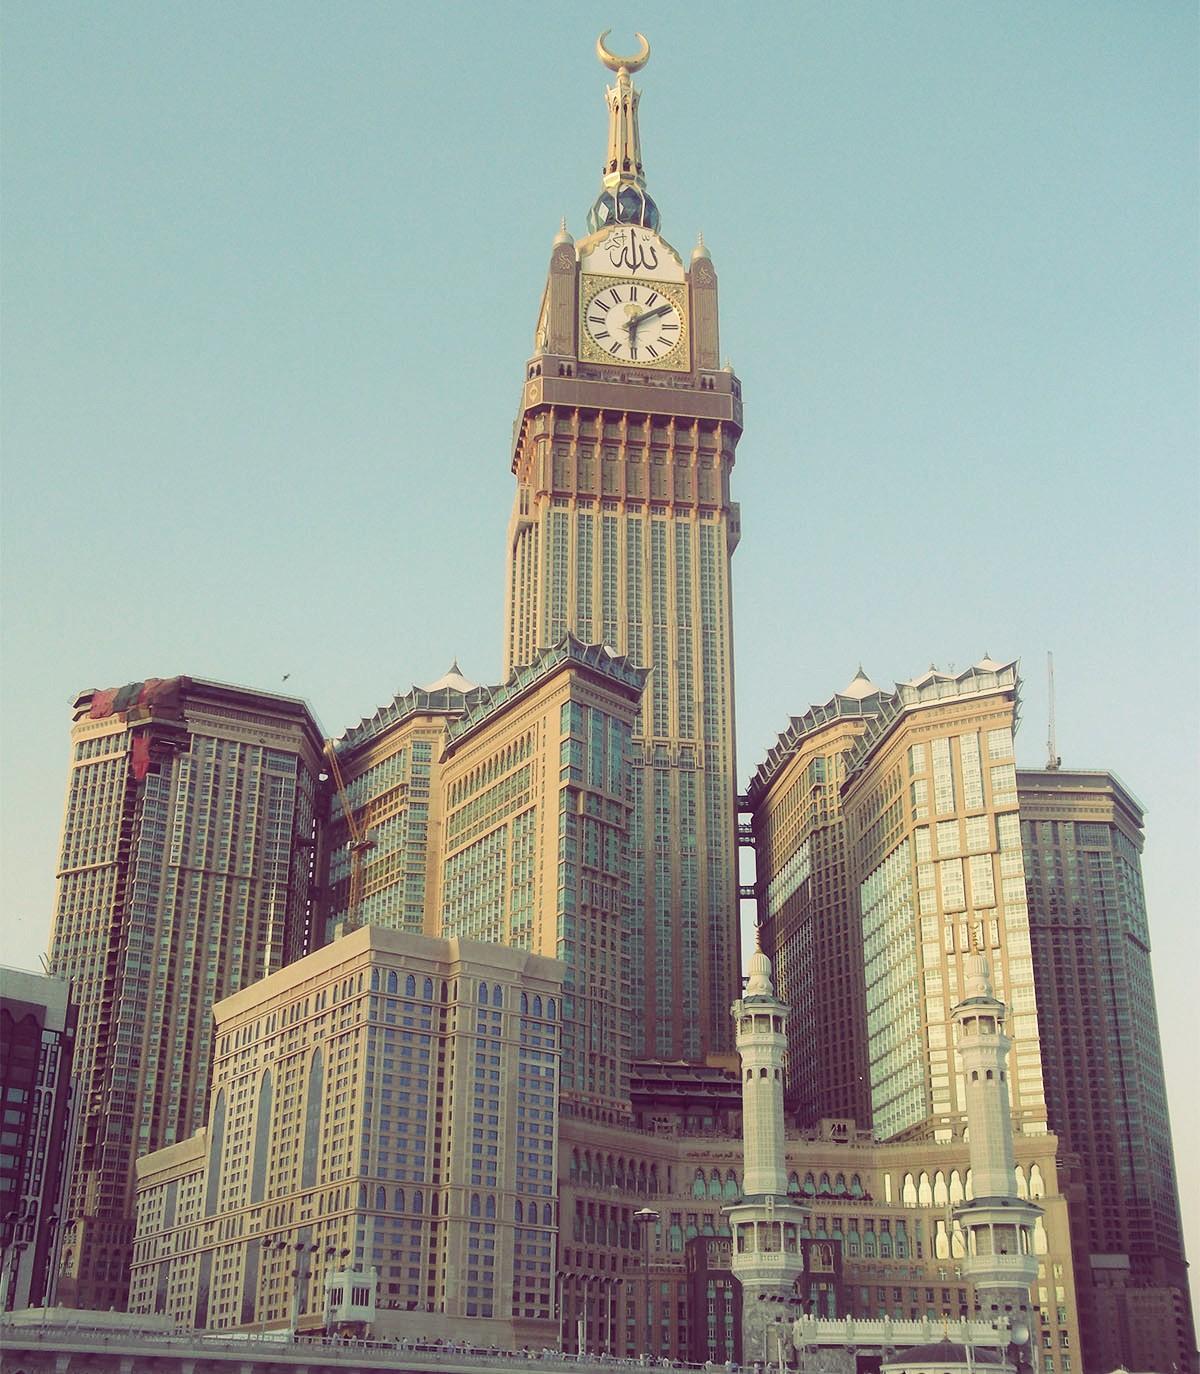 Abraj Al Bait, Saoedi-Arabië